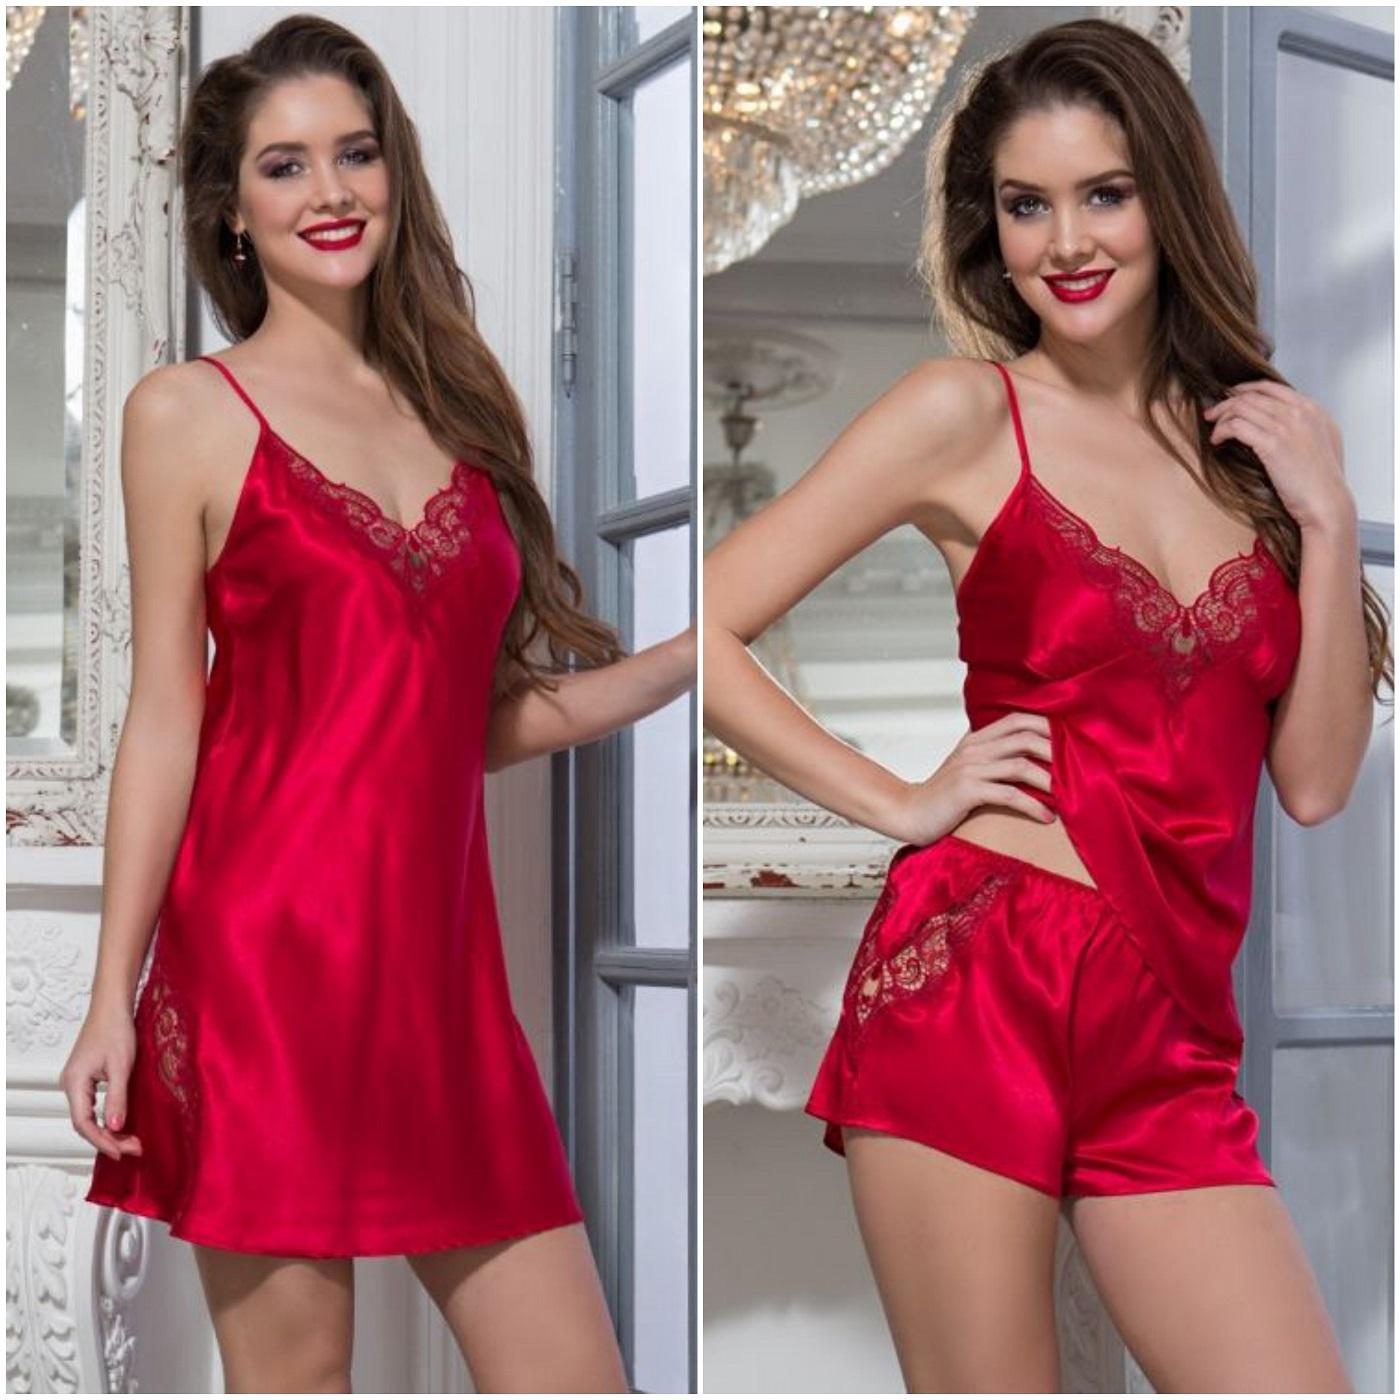 Сорочка пижама Mirabella Mia-Mia